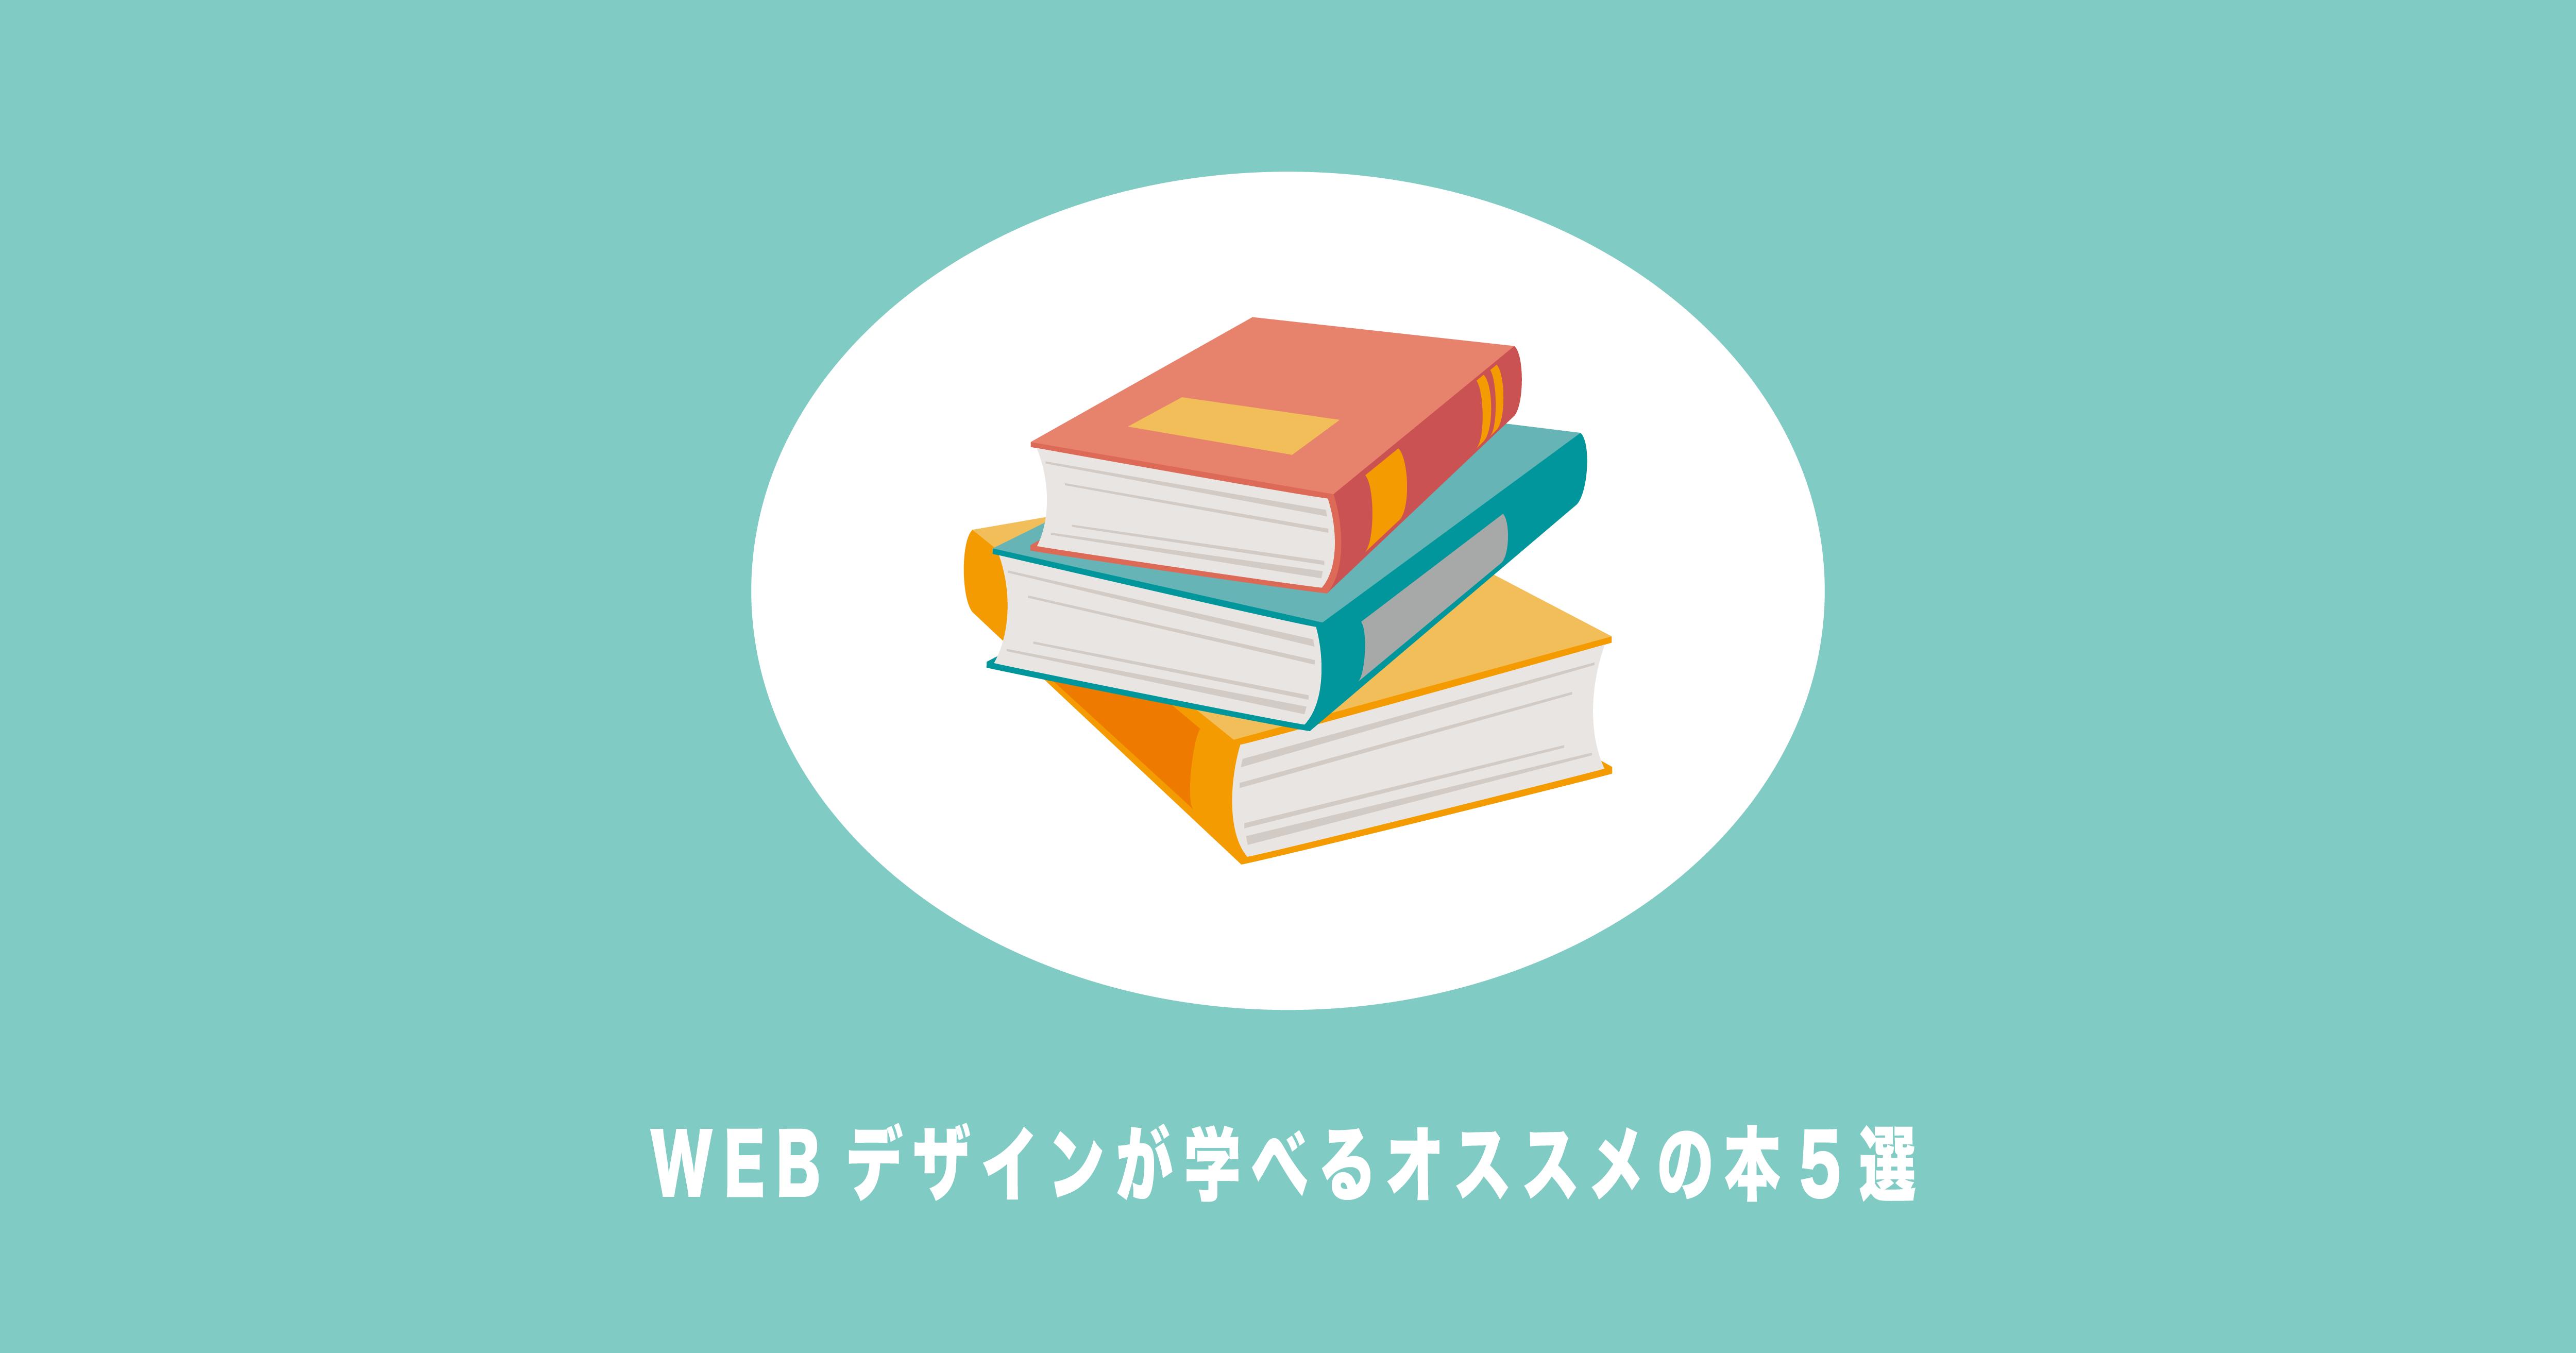 WEBデザインが学べるオススメの本5選